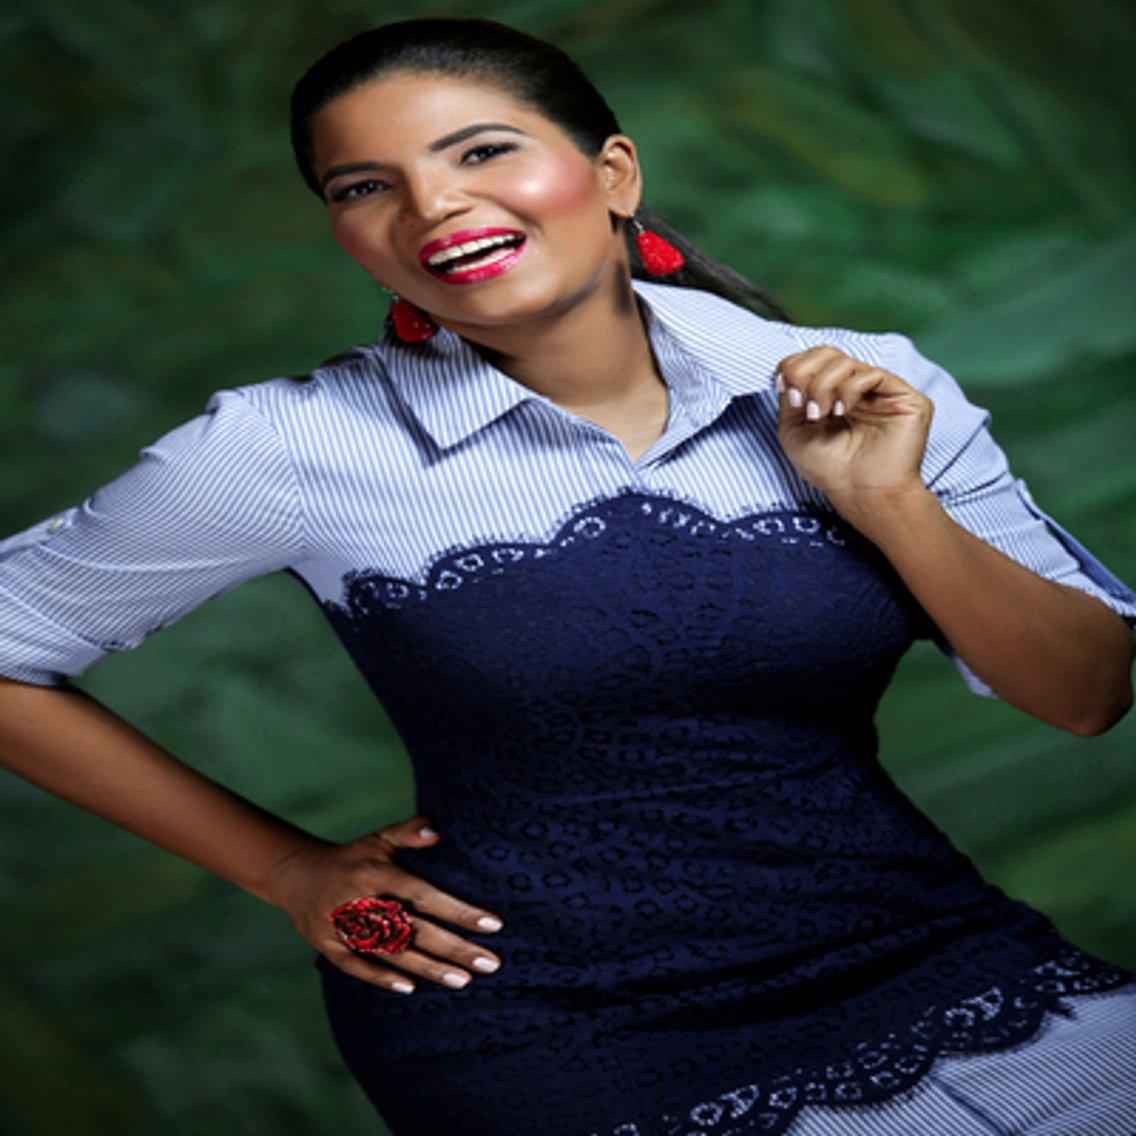 Anibelca Rosario Mas Cerca - immagine di copertina